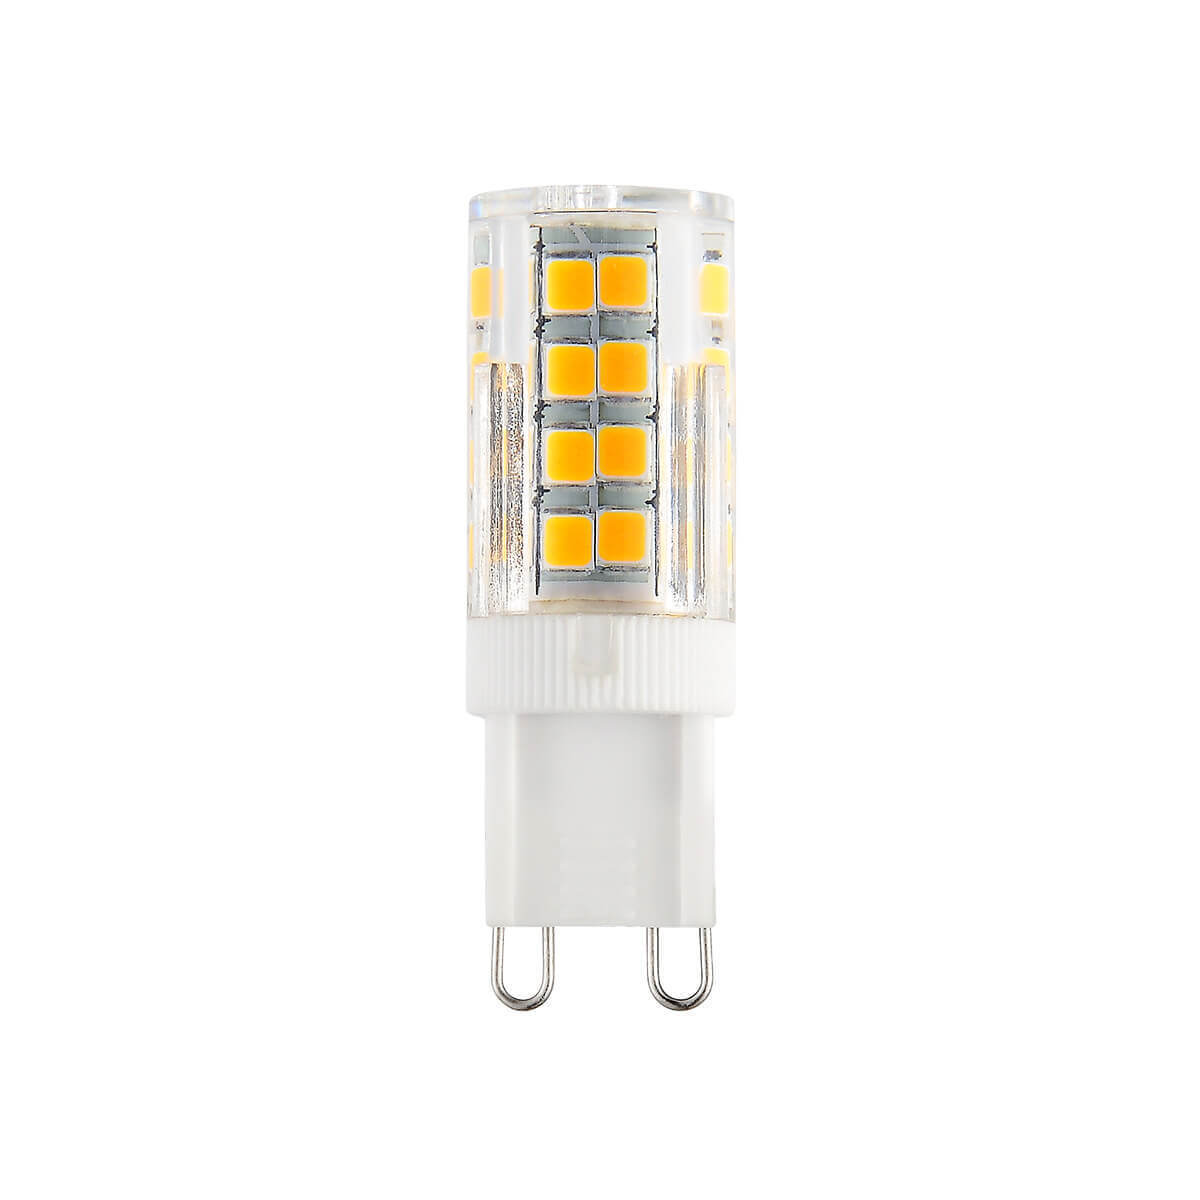 Лампочка Elektrostandard 4690389112980 G9 LED